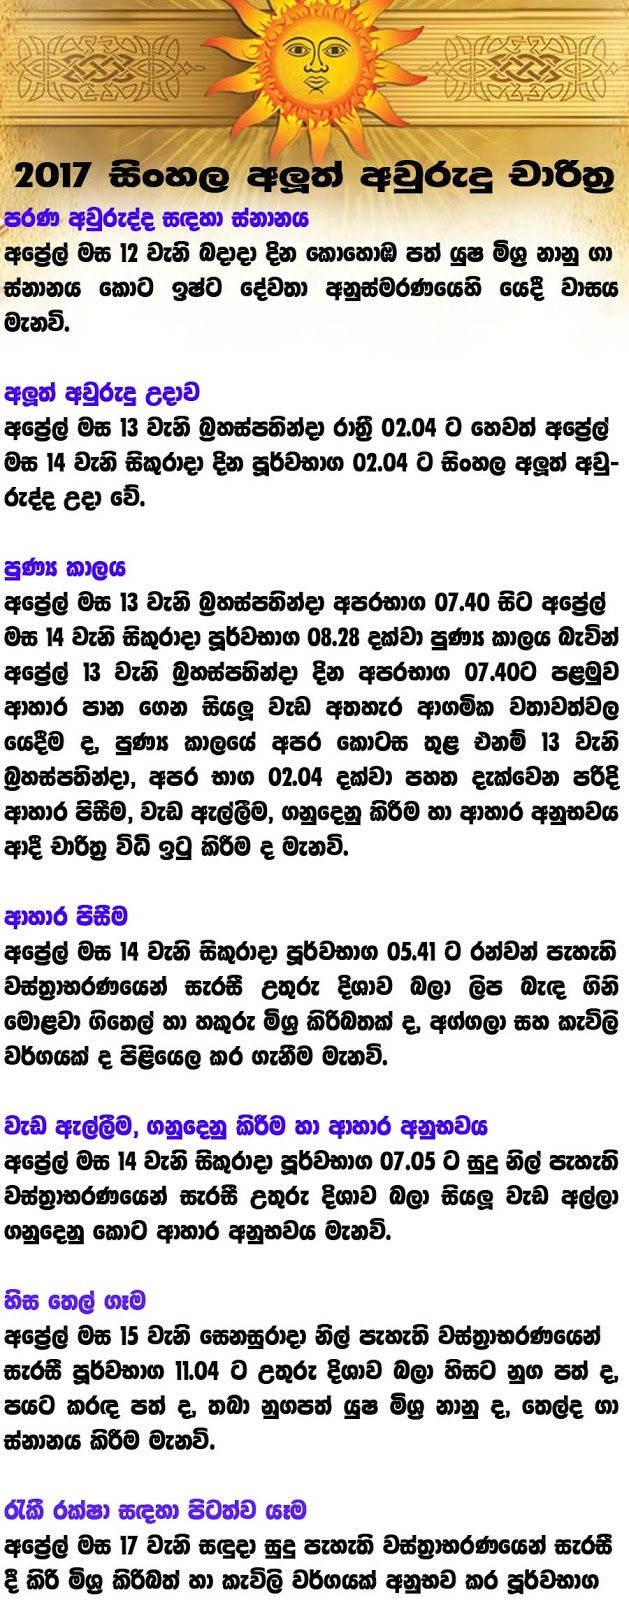 2017 Sinhala Litha >> 2017 Litha Sinhala Tamil Aluth Avurudu Nakath Litha